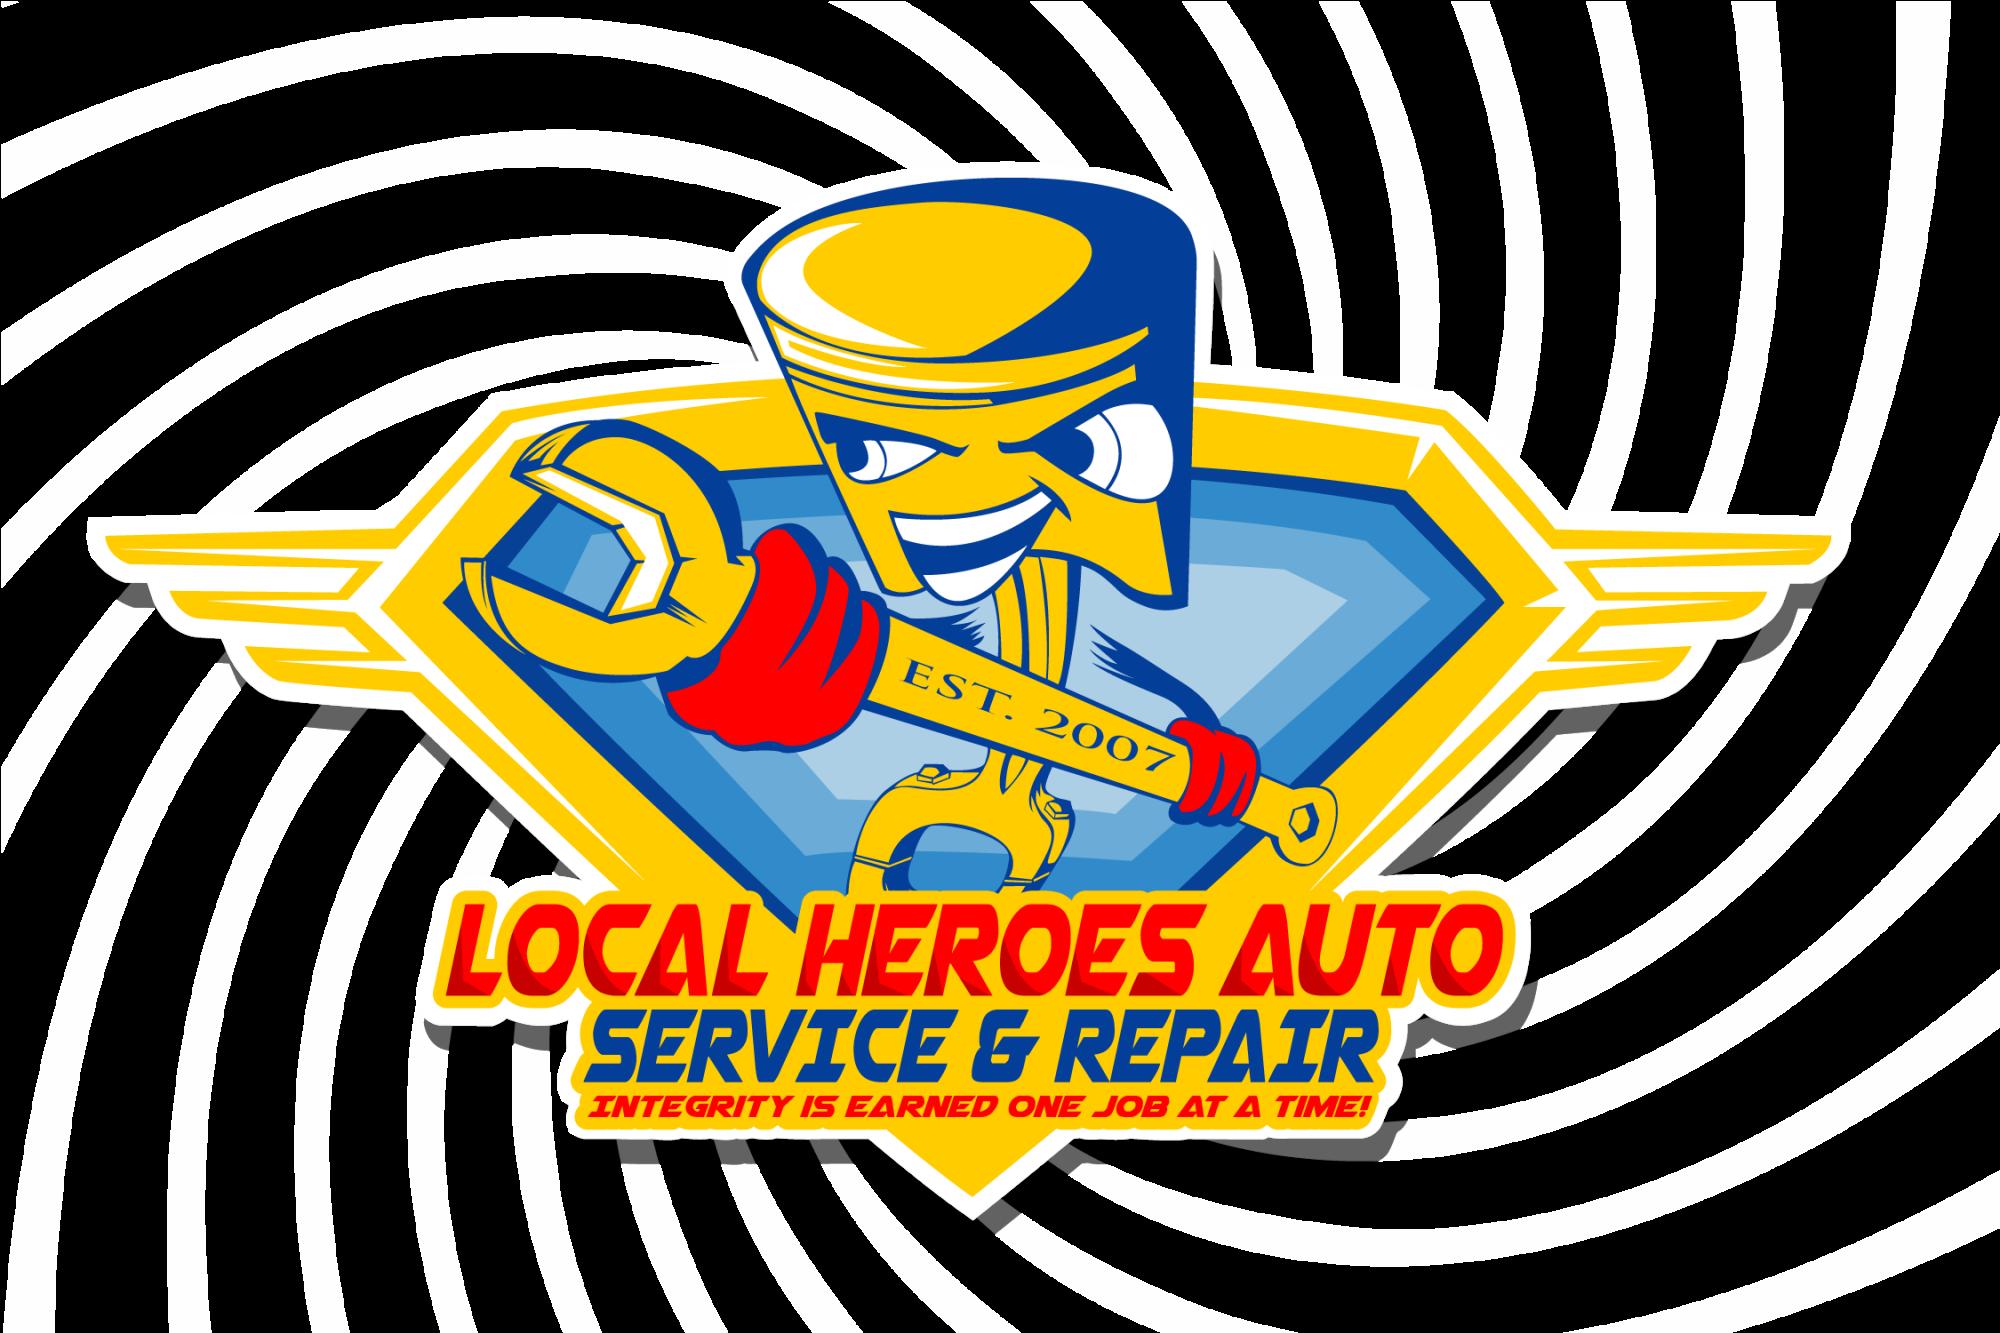 Local heroes auto repair. Mechanic clipart mechanical work